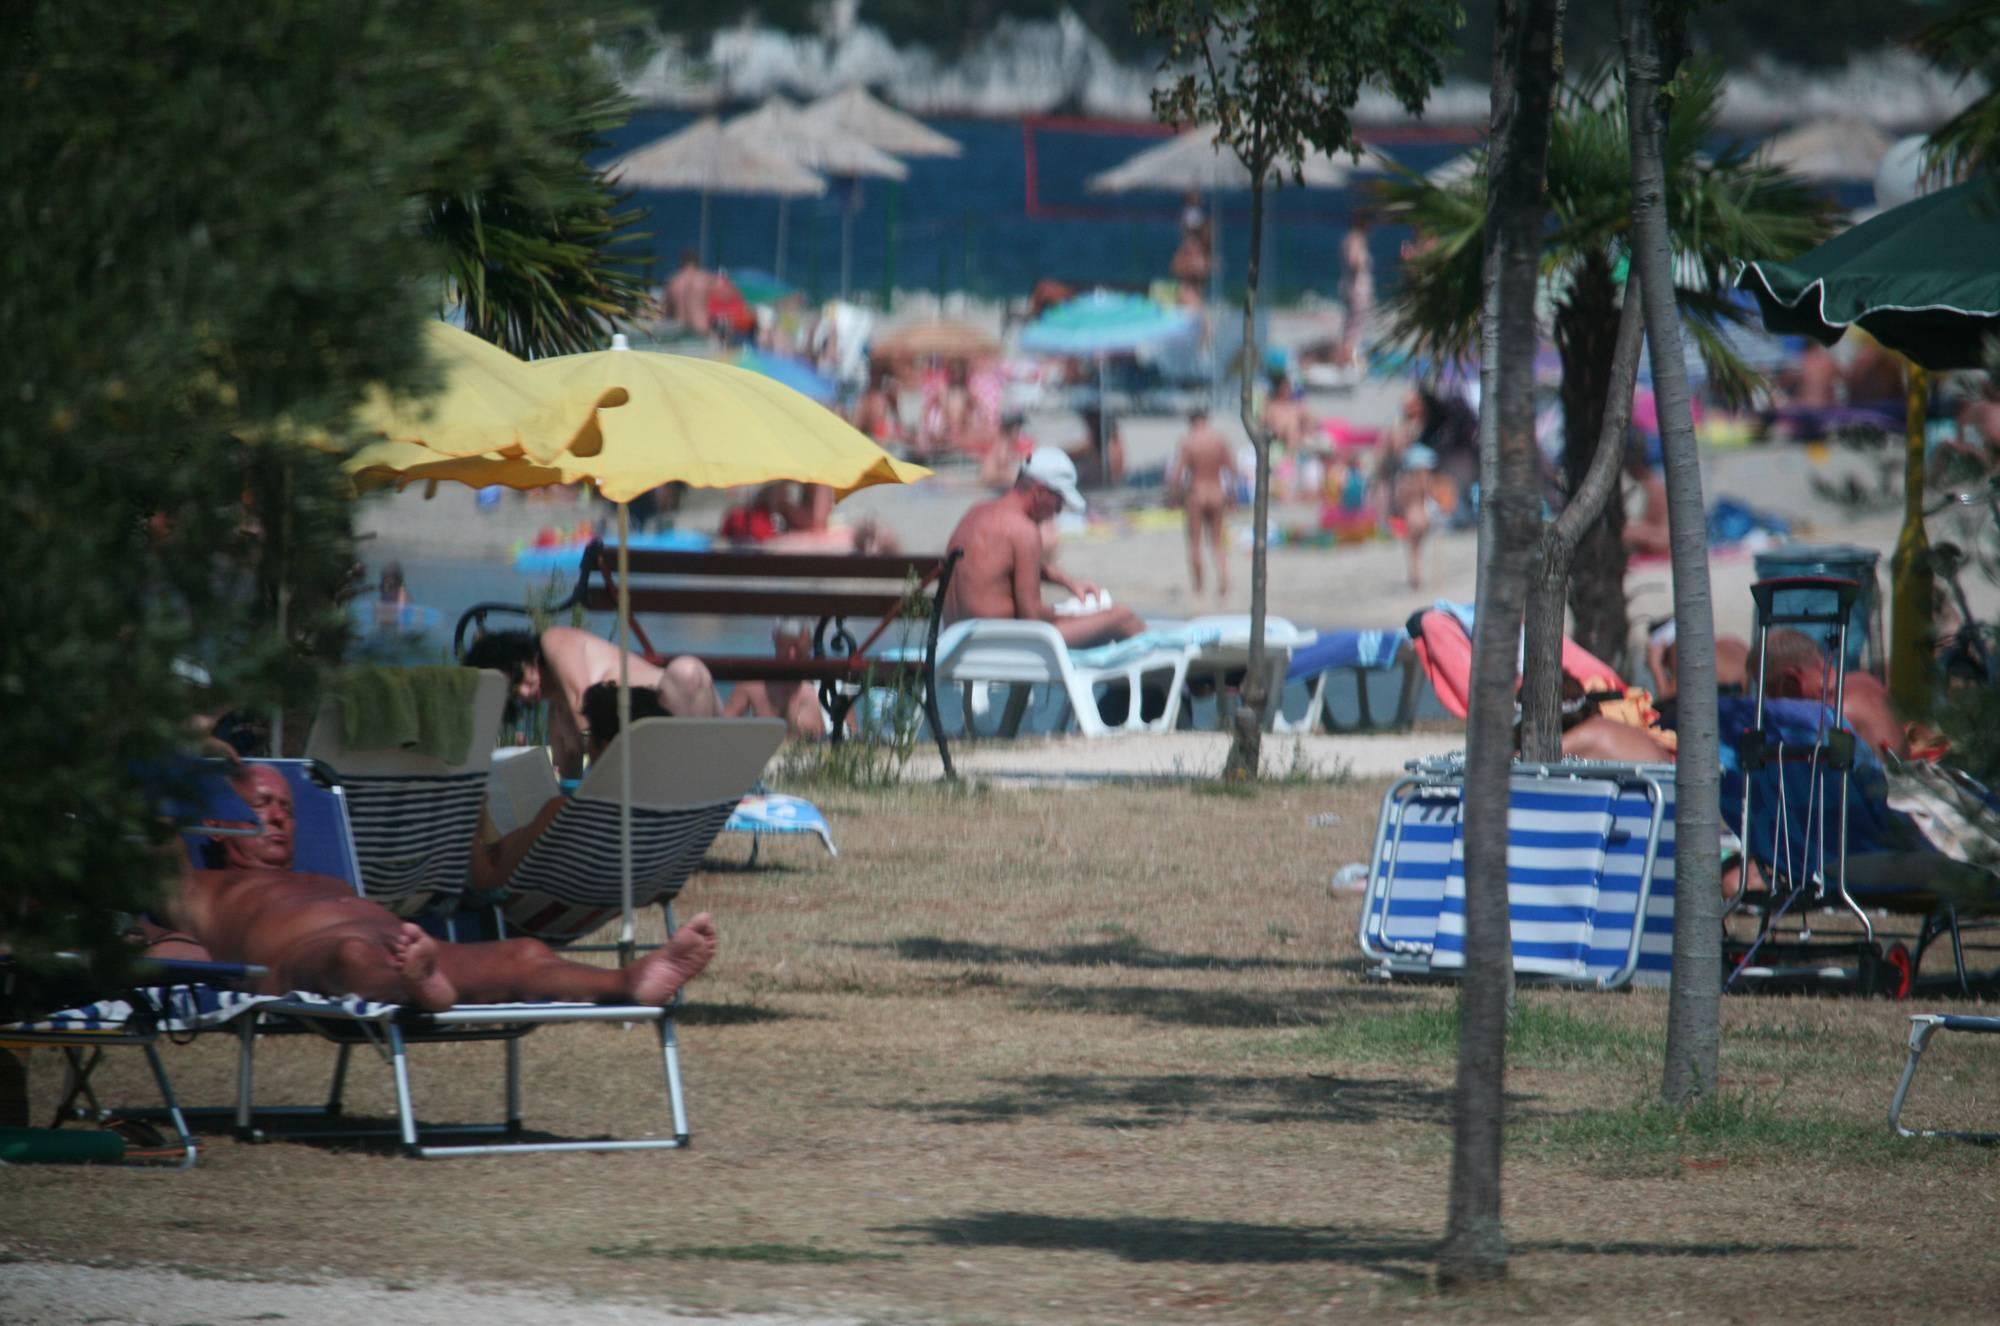 Avilia FKK Naturist Park - 2